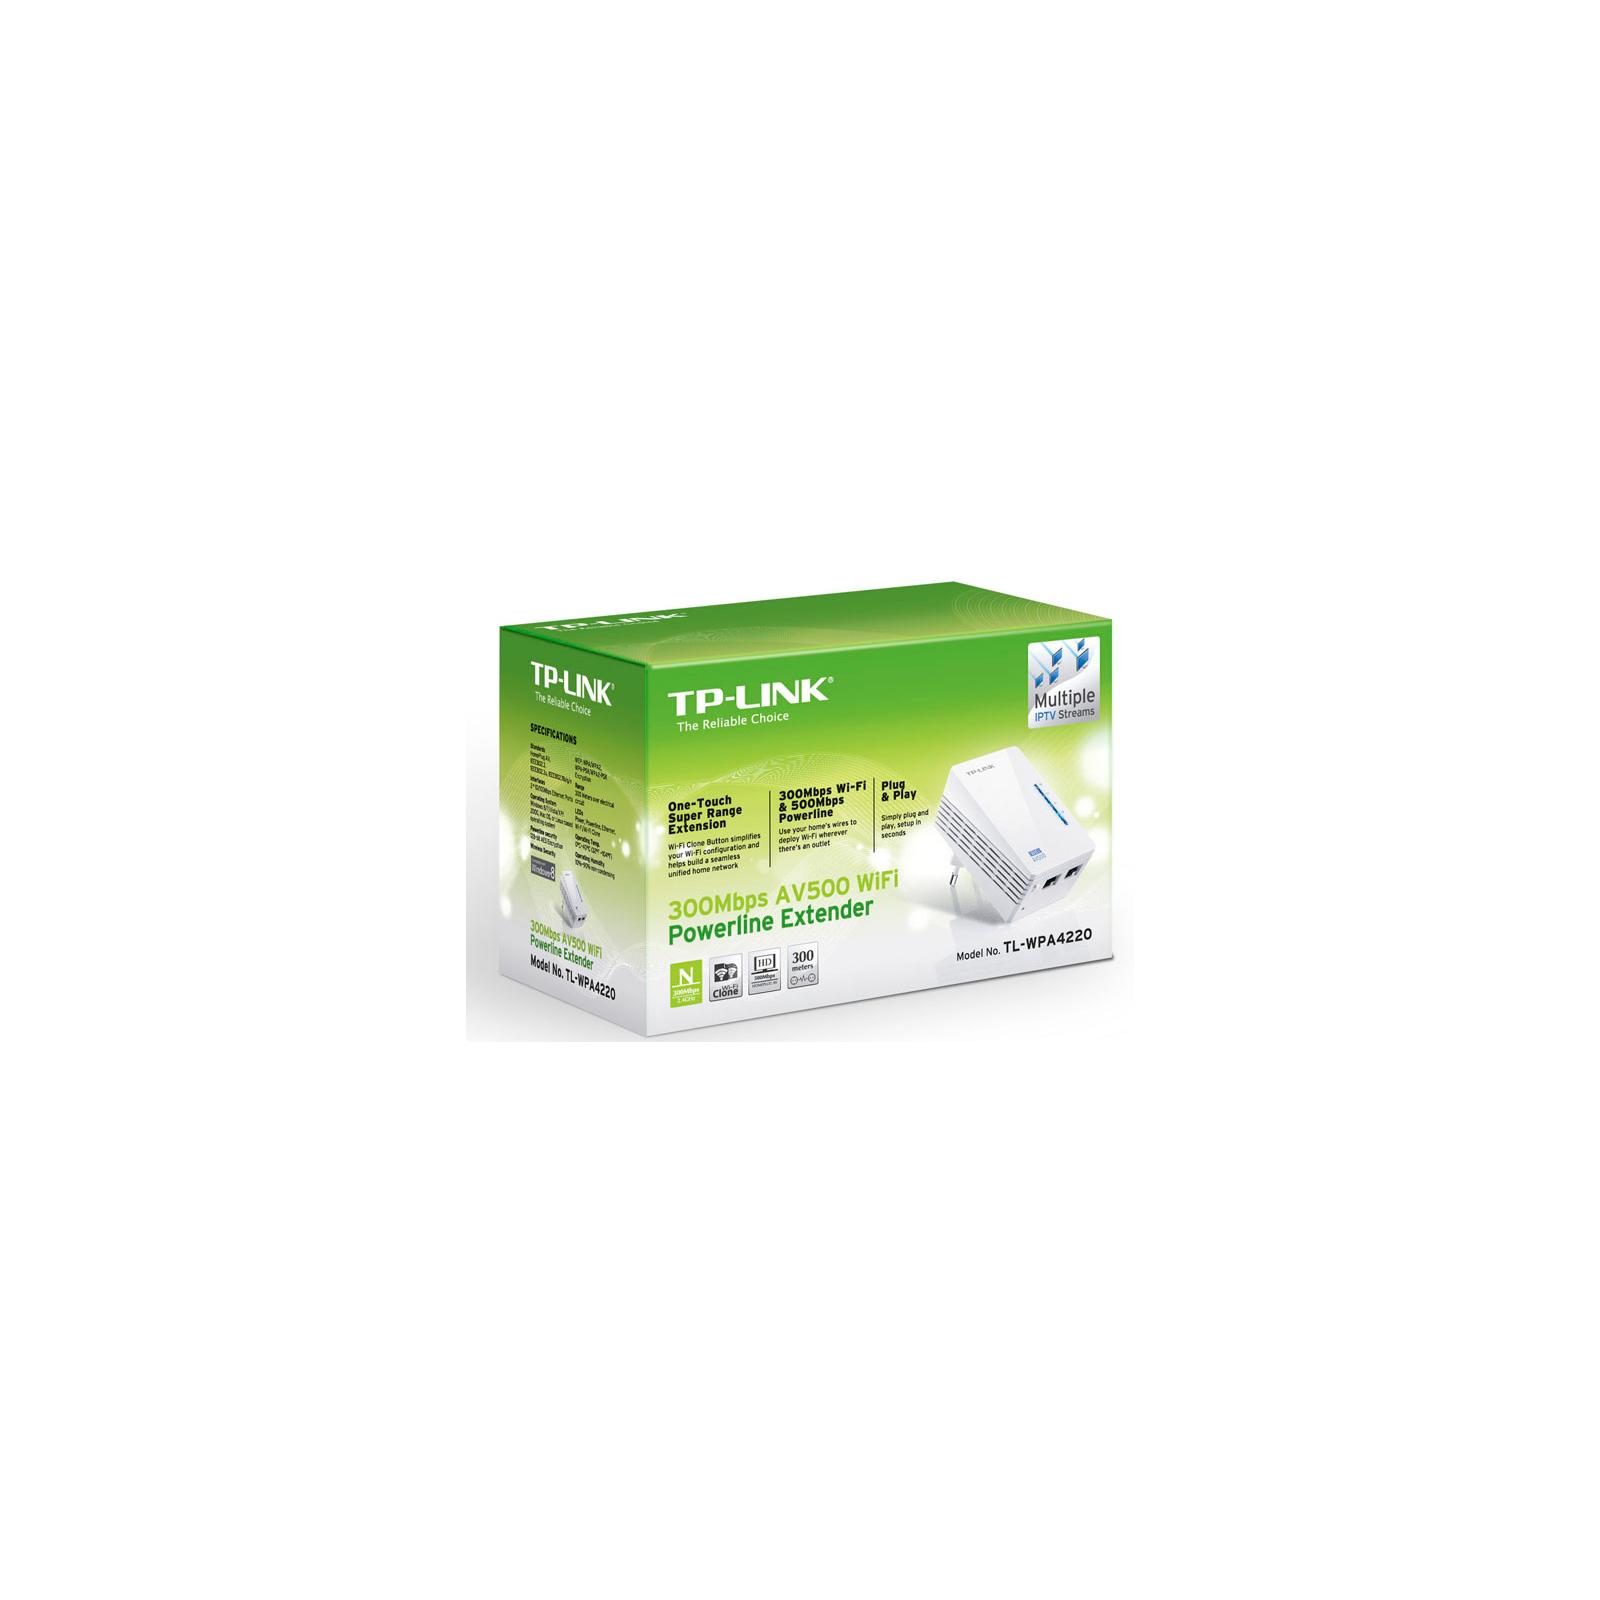 Адаптер Powerline TP-Link TL-WPA4220 изображение 6